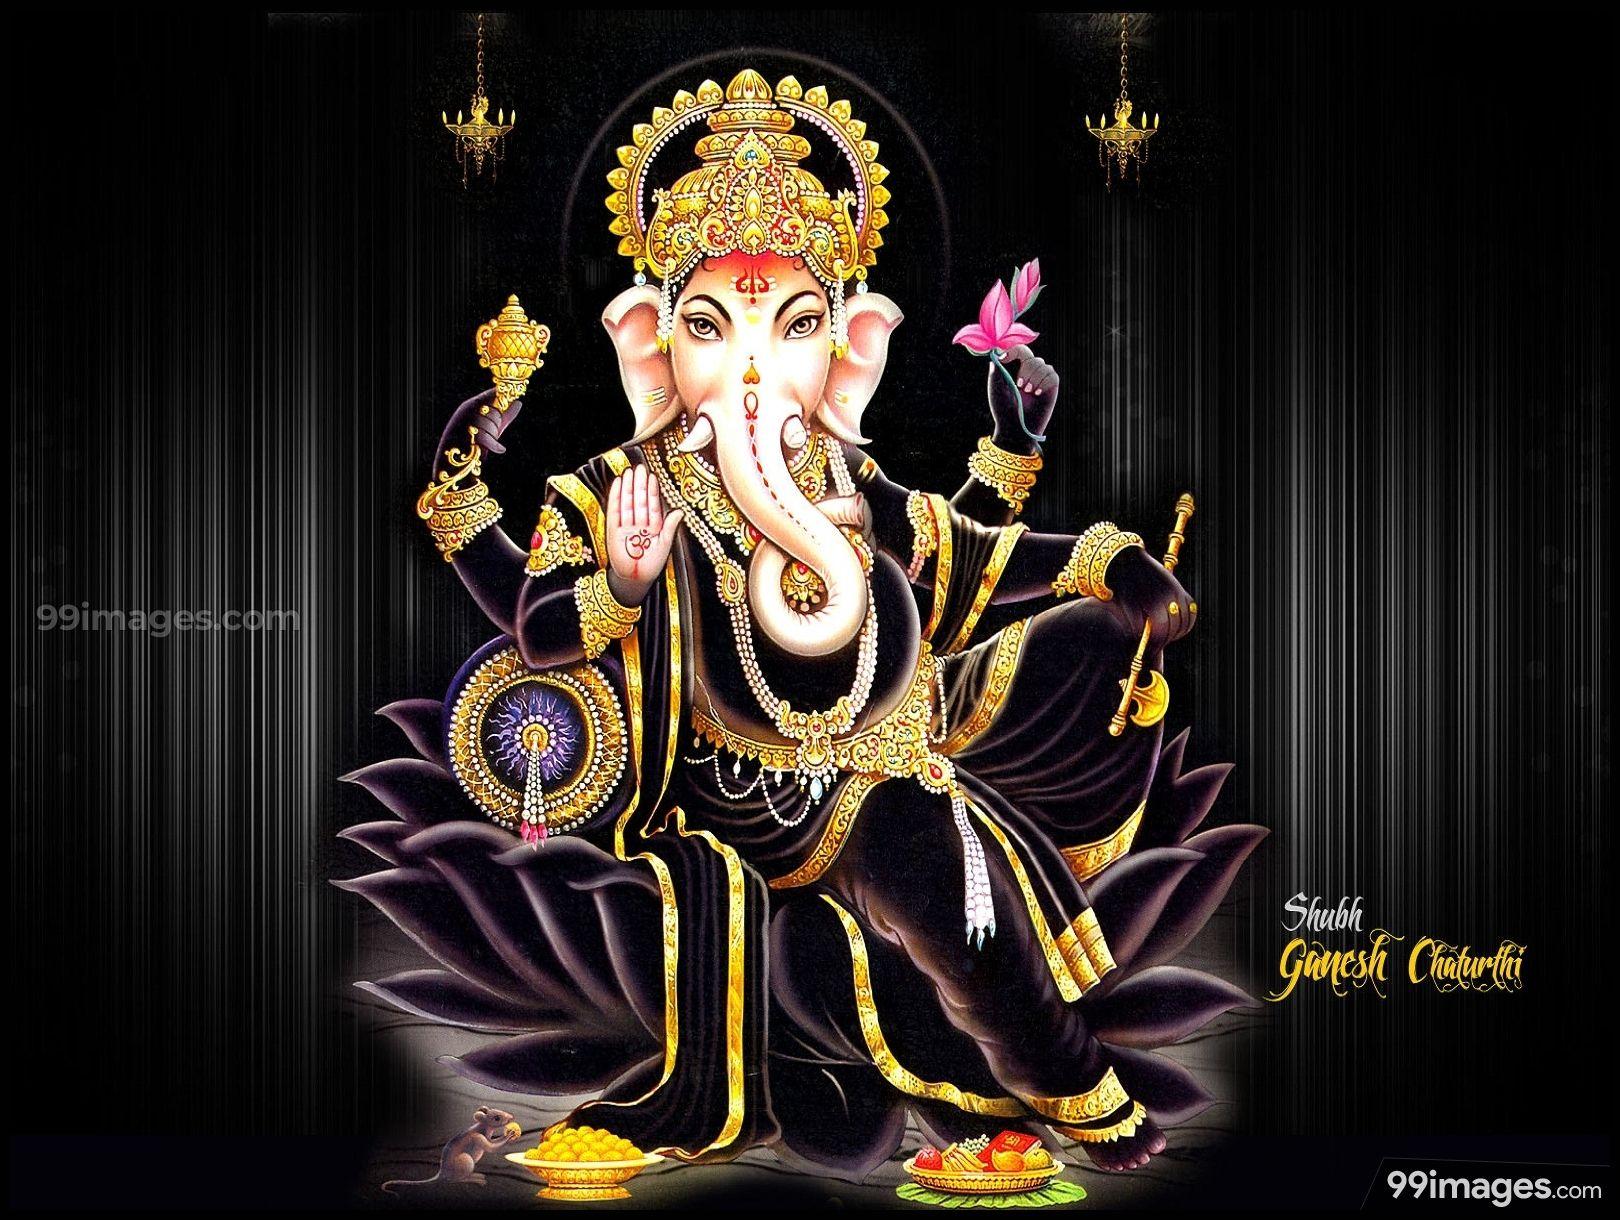 Lord Ganesha Best Hd Photos 1080p 7007 Lordganesha Pillaiyar Vinayagar Ganeshan God Hin Happy Ganesh Chaturthi Ganesh Chaturthi Images Ganesh Images